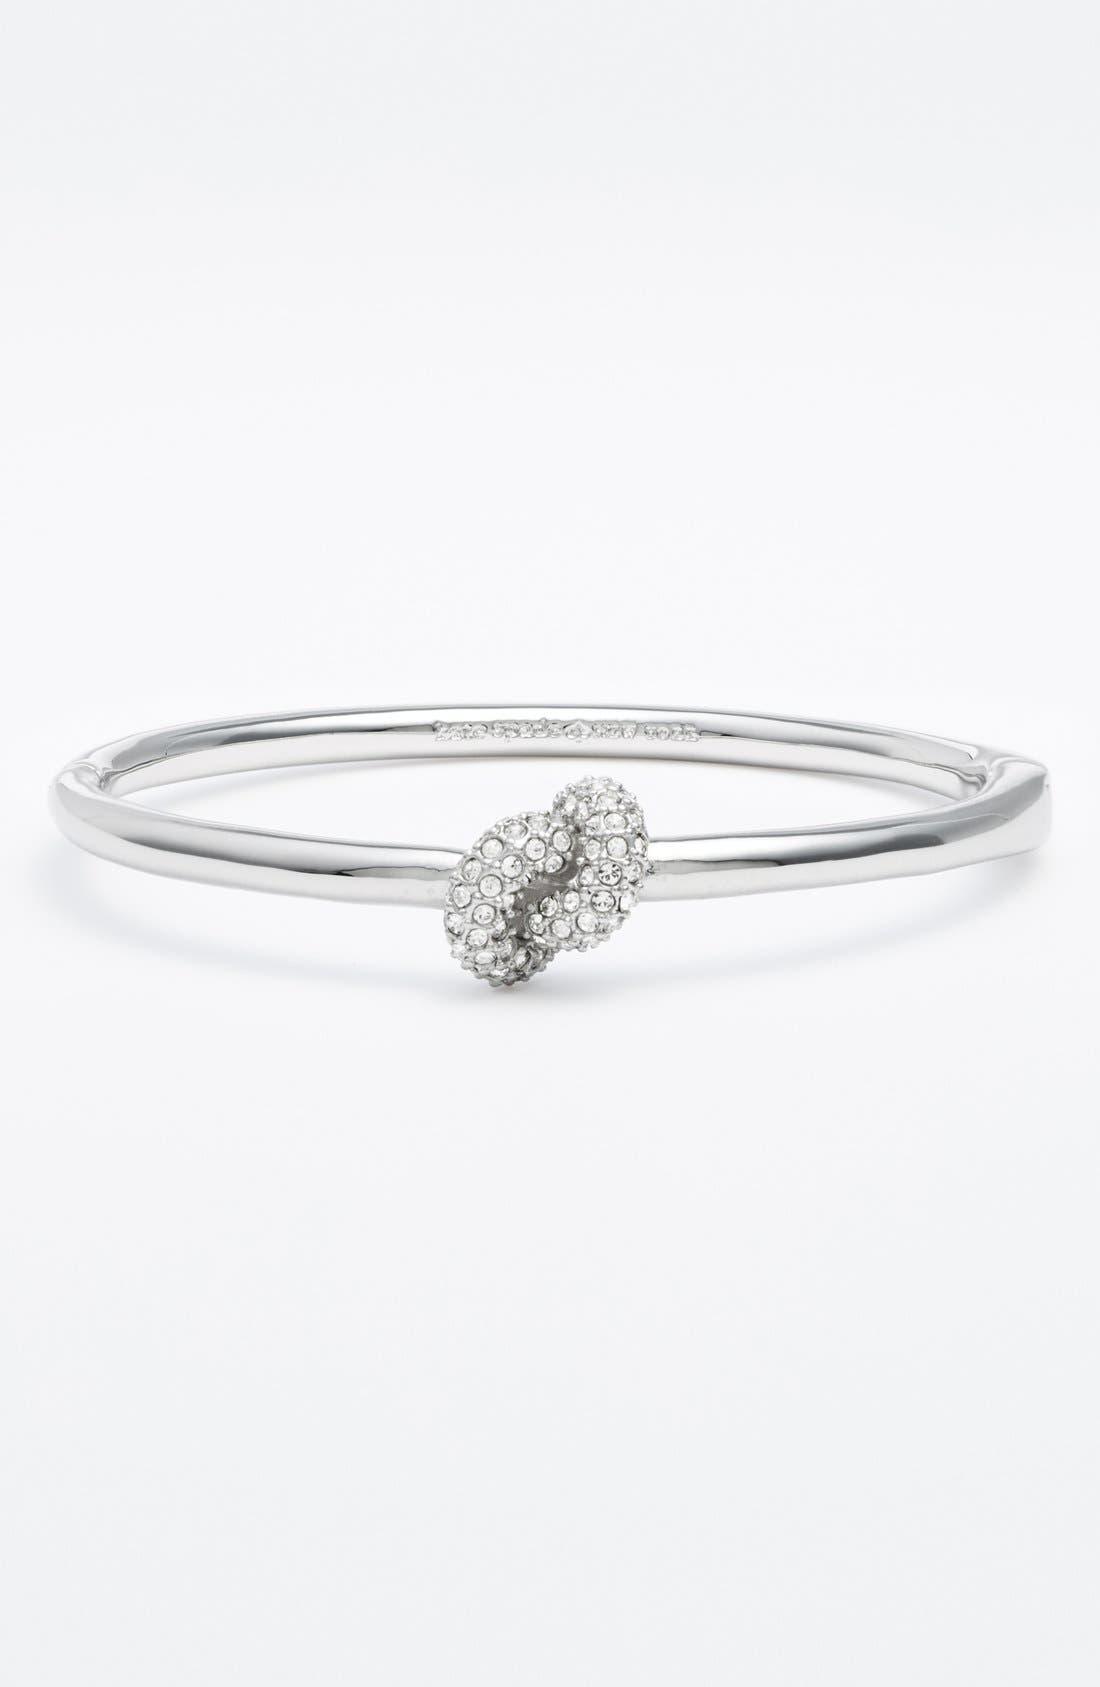 'sailors' knot' hinged bracelet,                             Main thumbnail 1, color,                             Clear/ Silver